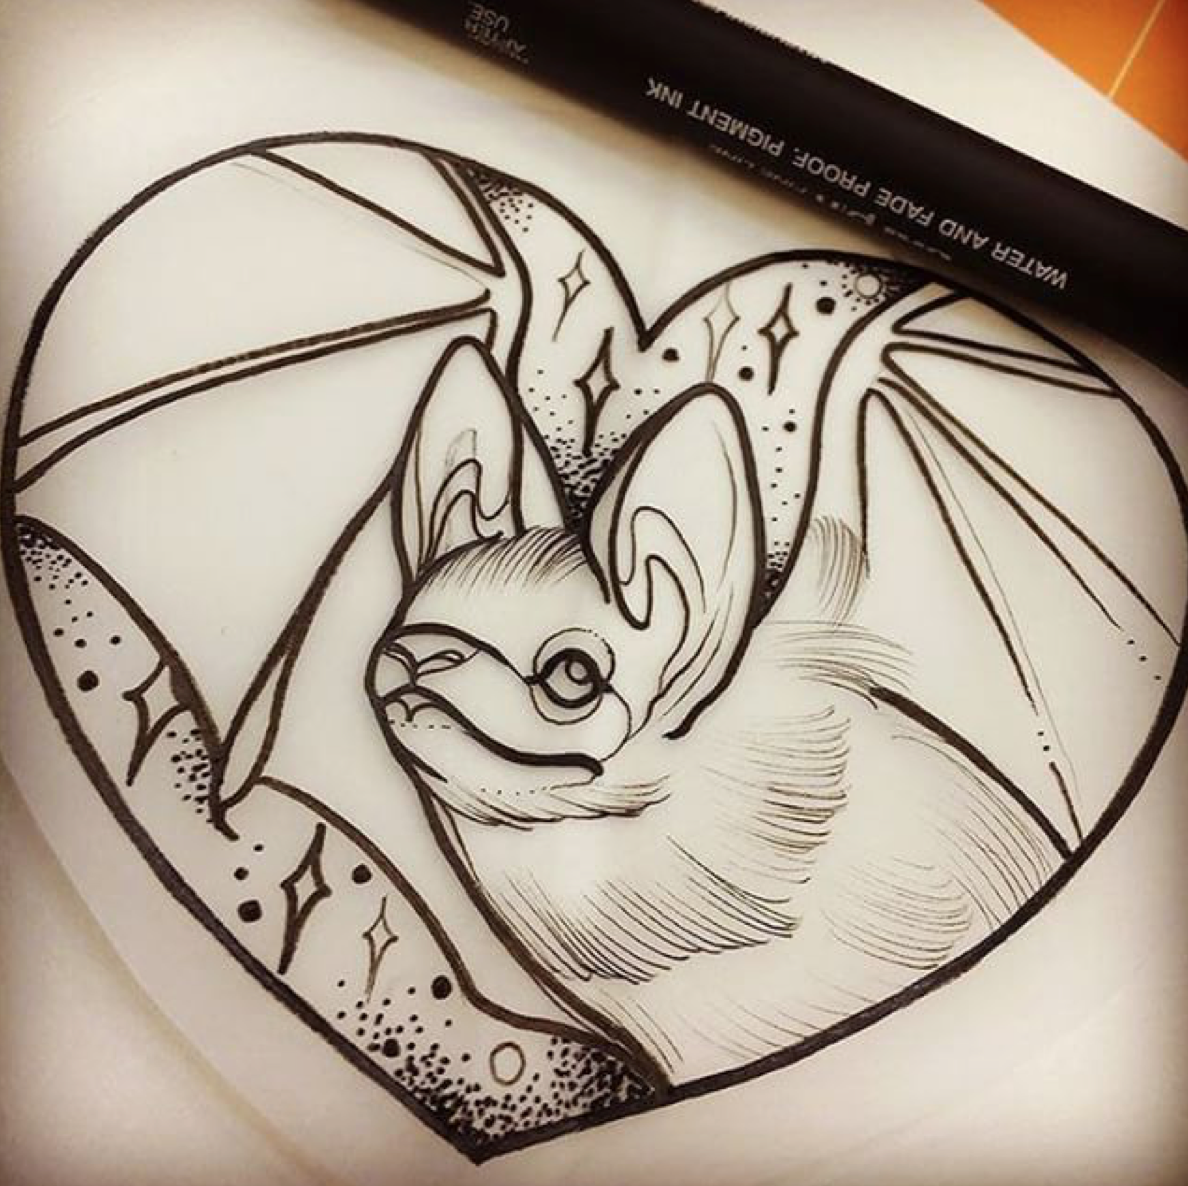 ohhhhh i adore bats kickass tattoo ideas pinterest. Black Bedroom Furniture Sets. Home Design Ideas